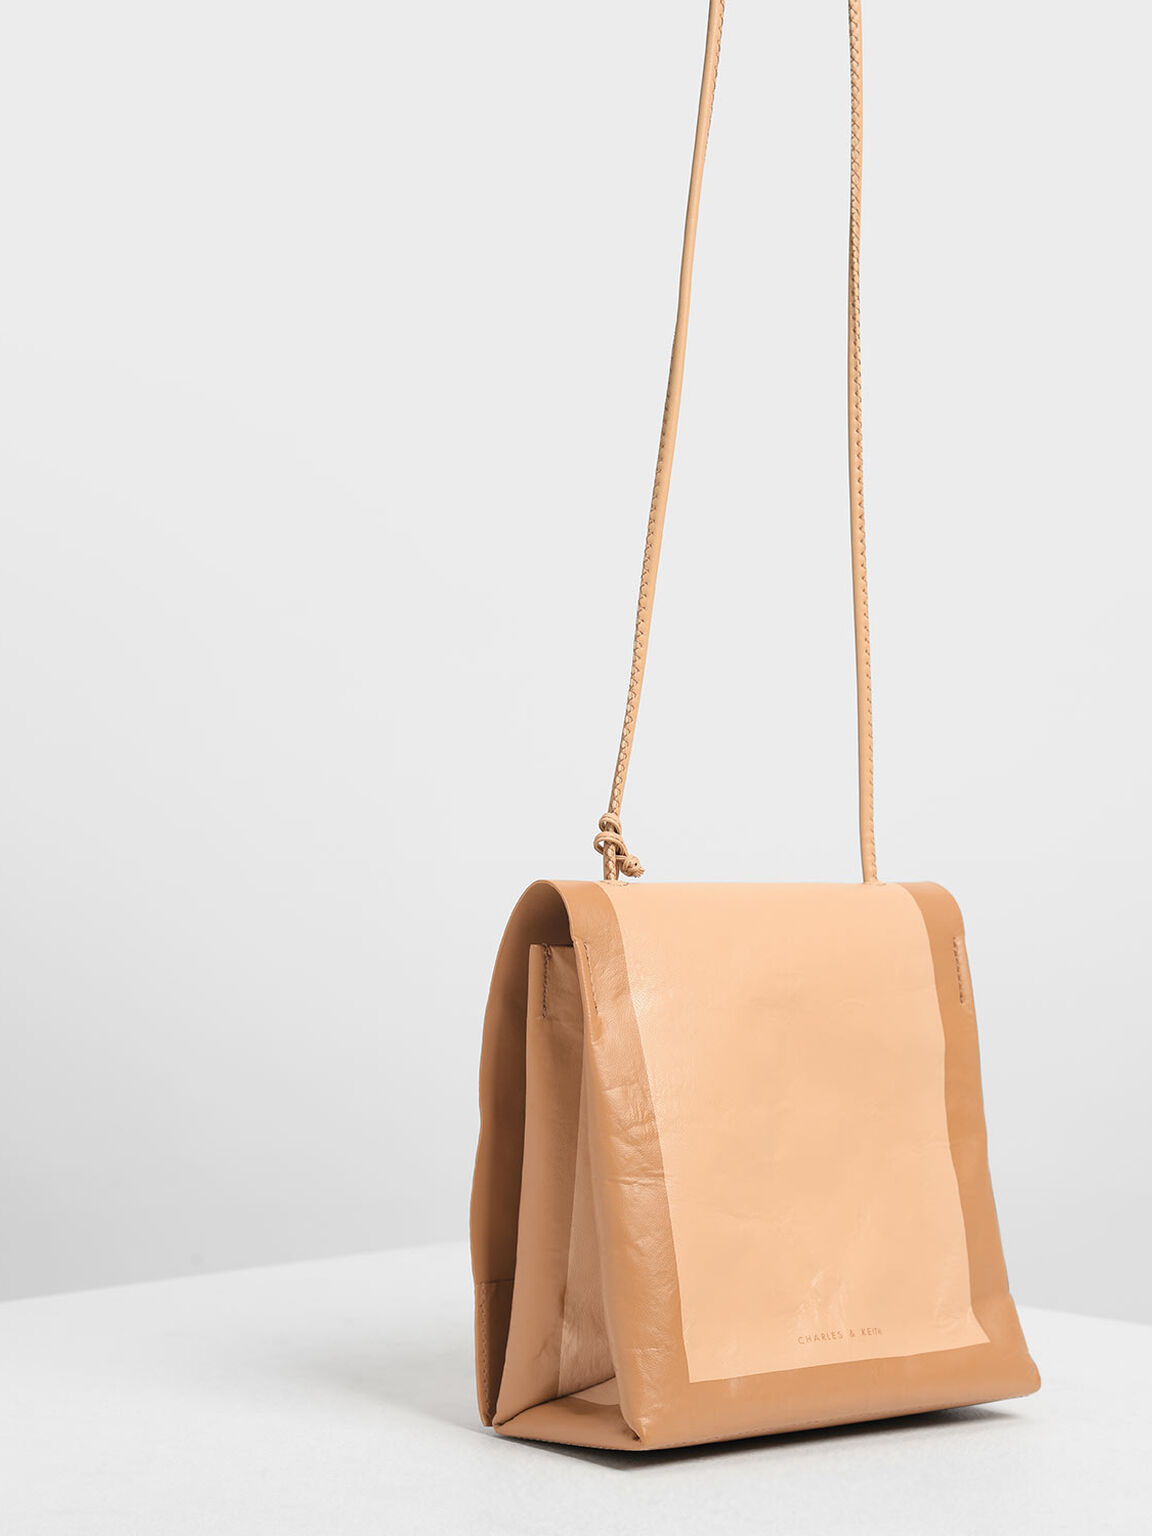 Crumpled Effect Top Handle Bag, Beige, hi-res